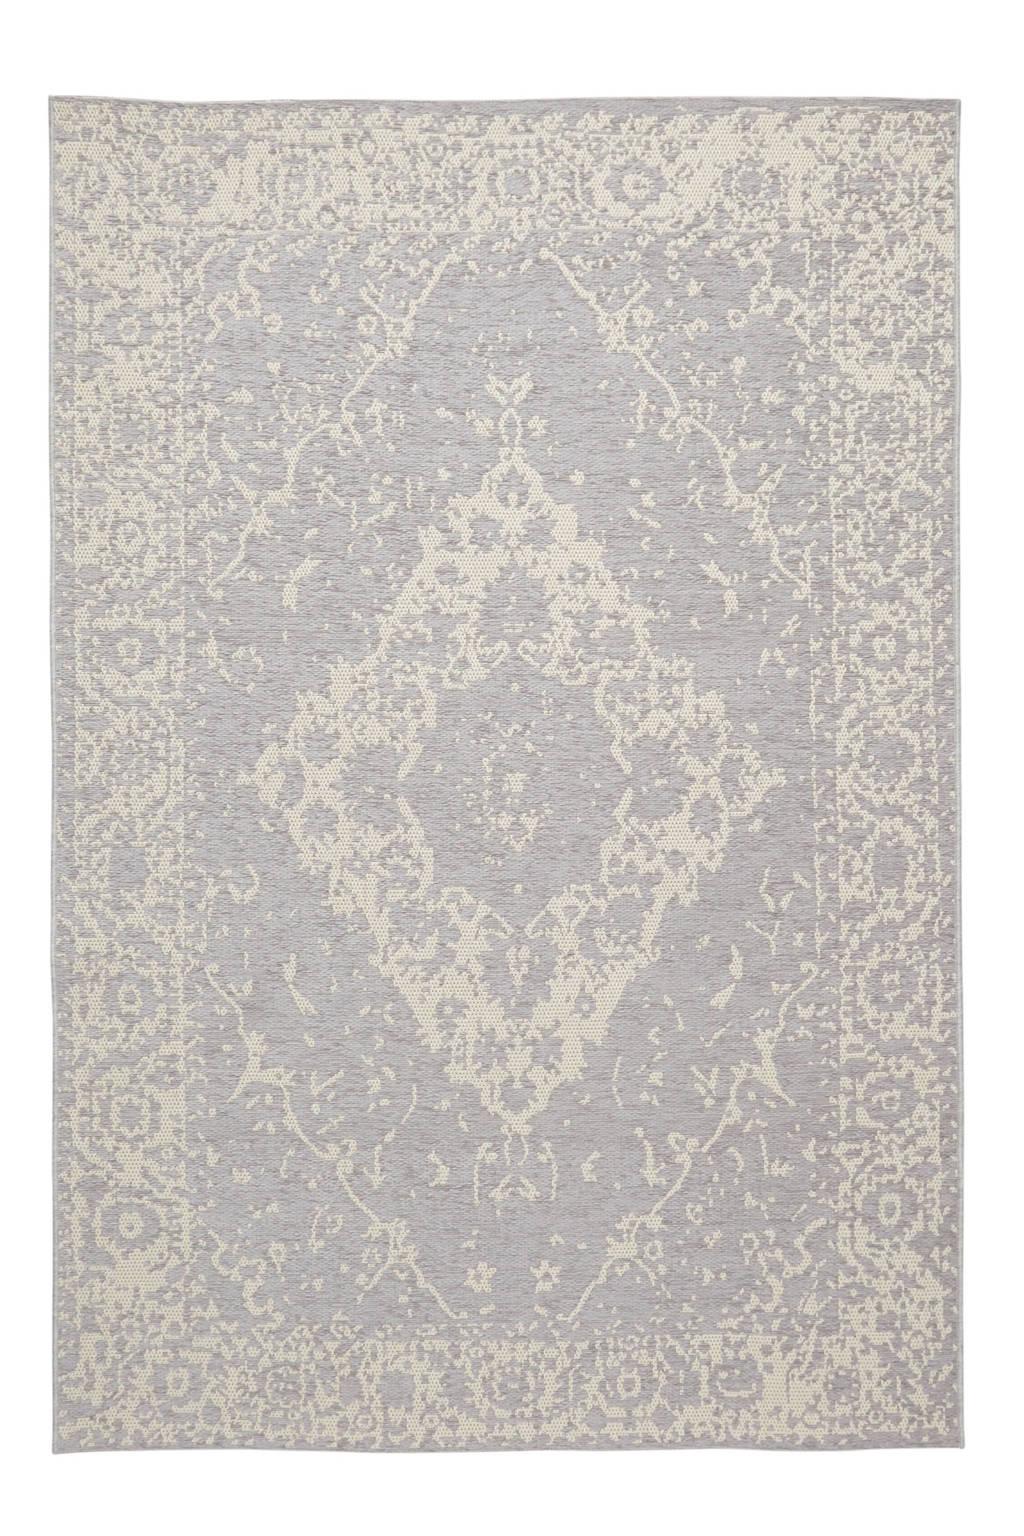 whkmp's own vloerkleed  (230x160 cm), Lichtgrijs